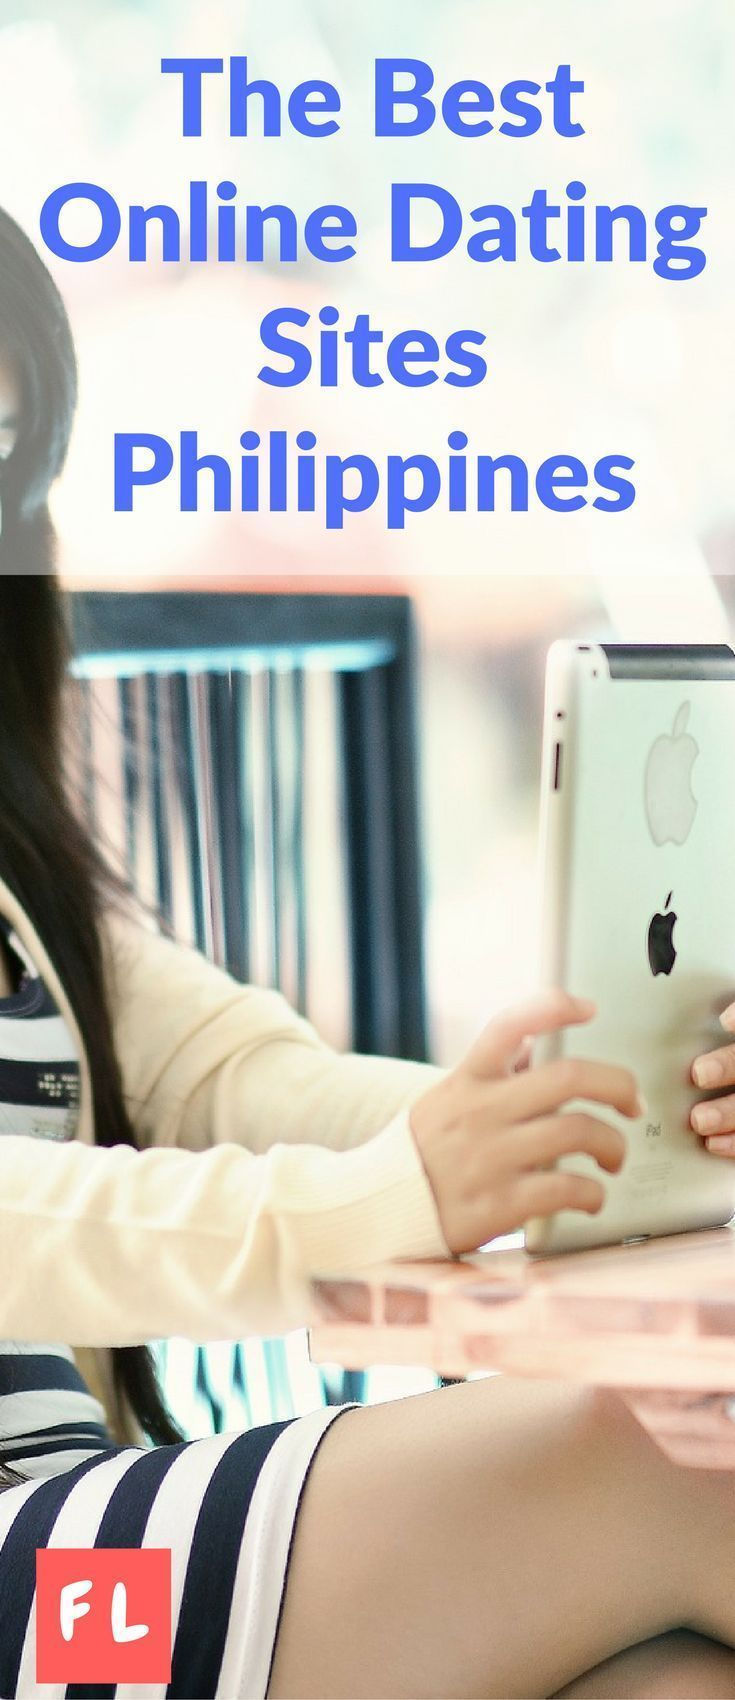 Top εφαρμογές dating στις Φιλιππίνες